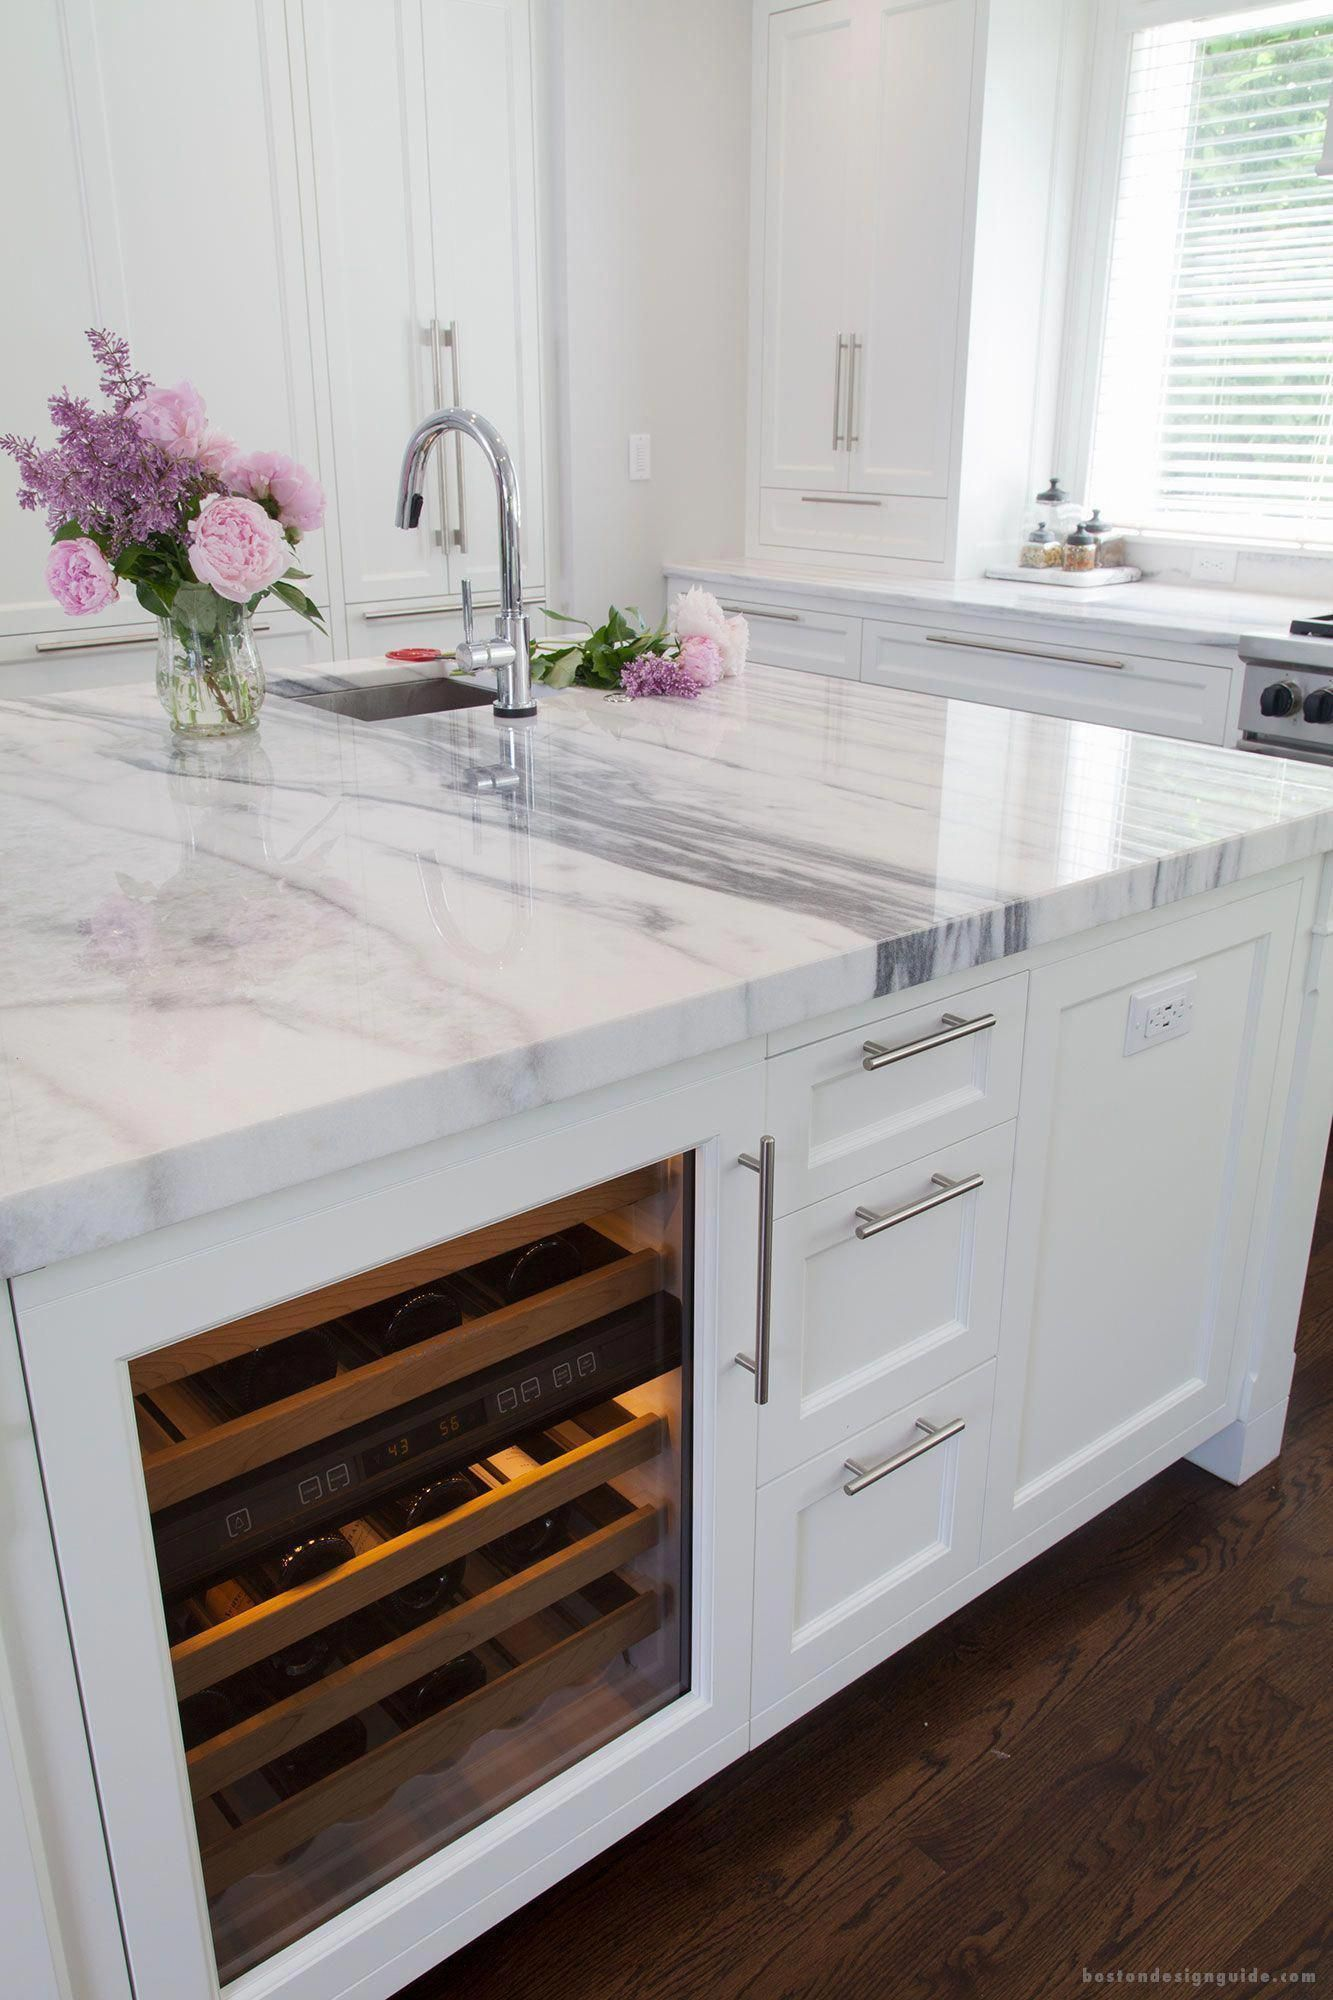 31 Remarkable Kitchen Countertops Options 2019 #marblecountertops